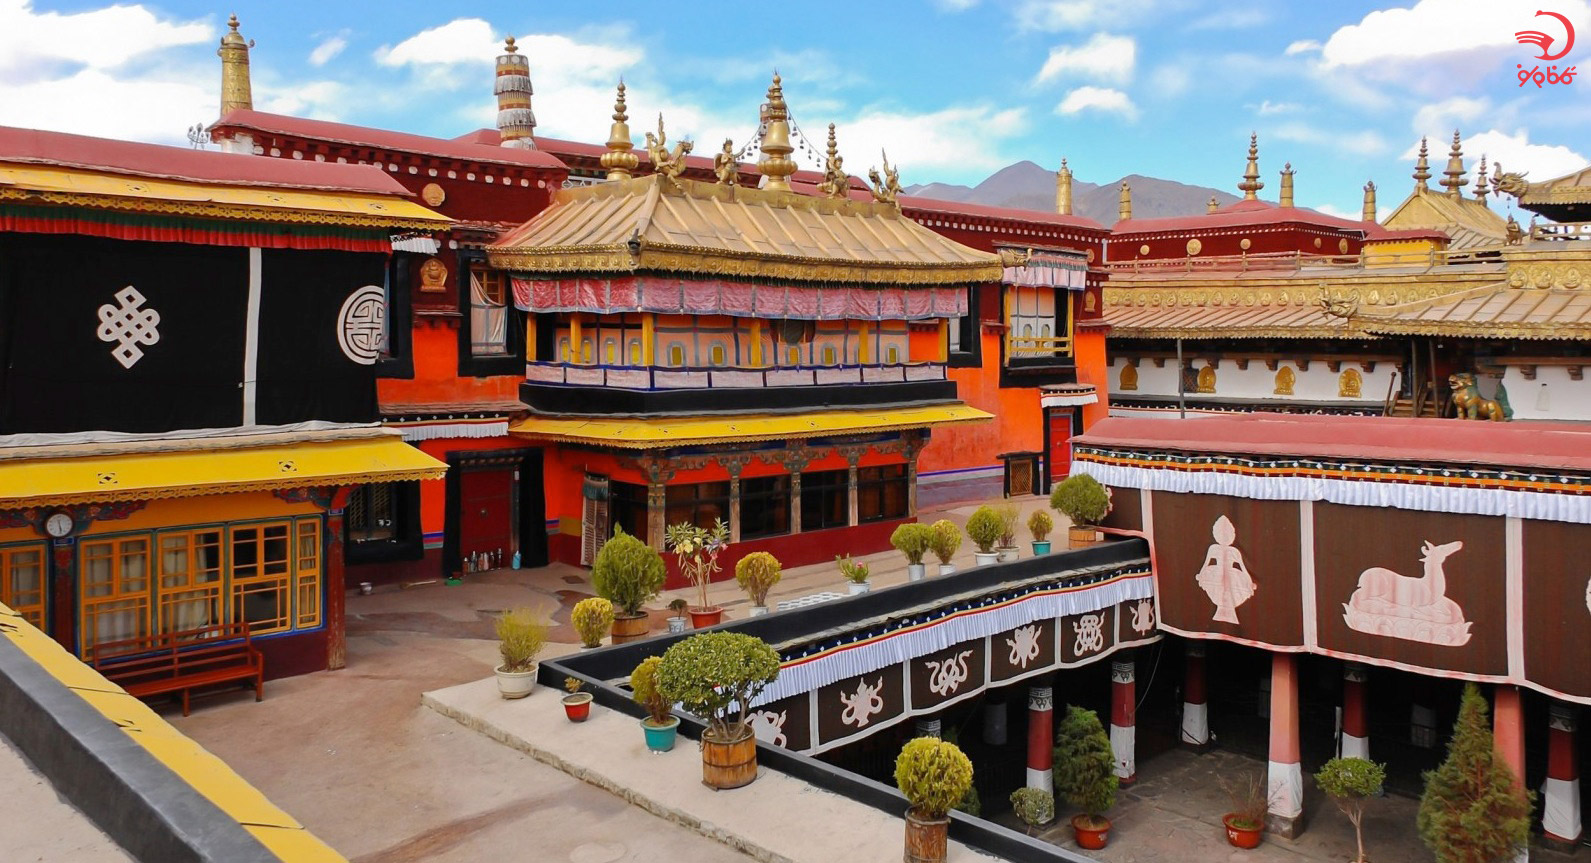 معبد جومونگ